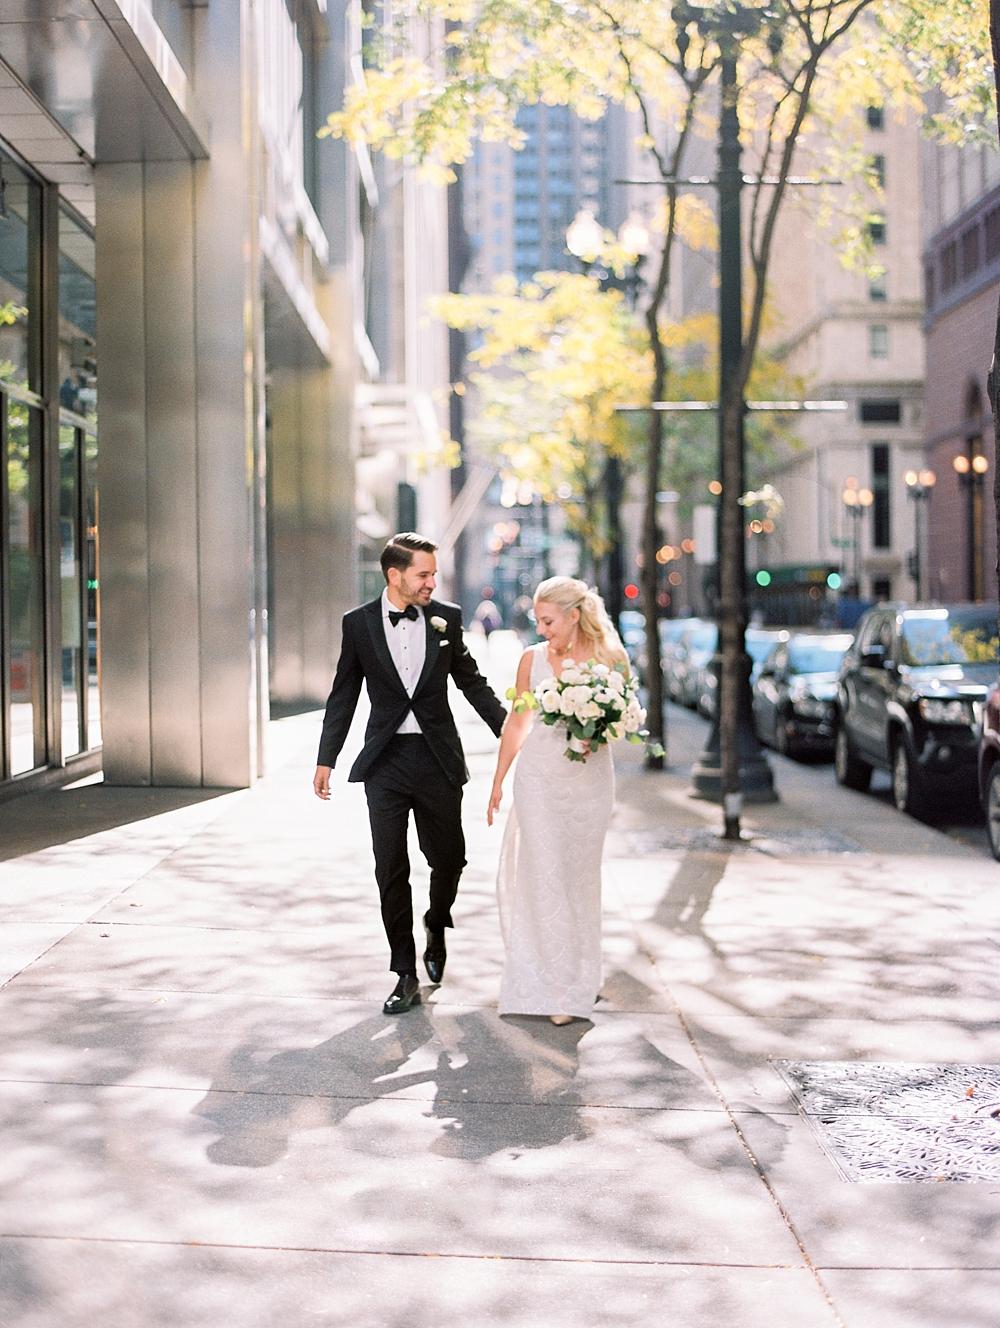 kristin-la-voie-photography-chicago-Wedding-Photographer-kimpton-gray-hotel-24